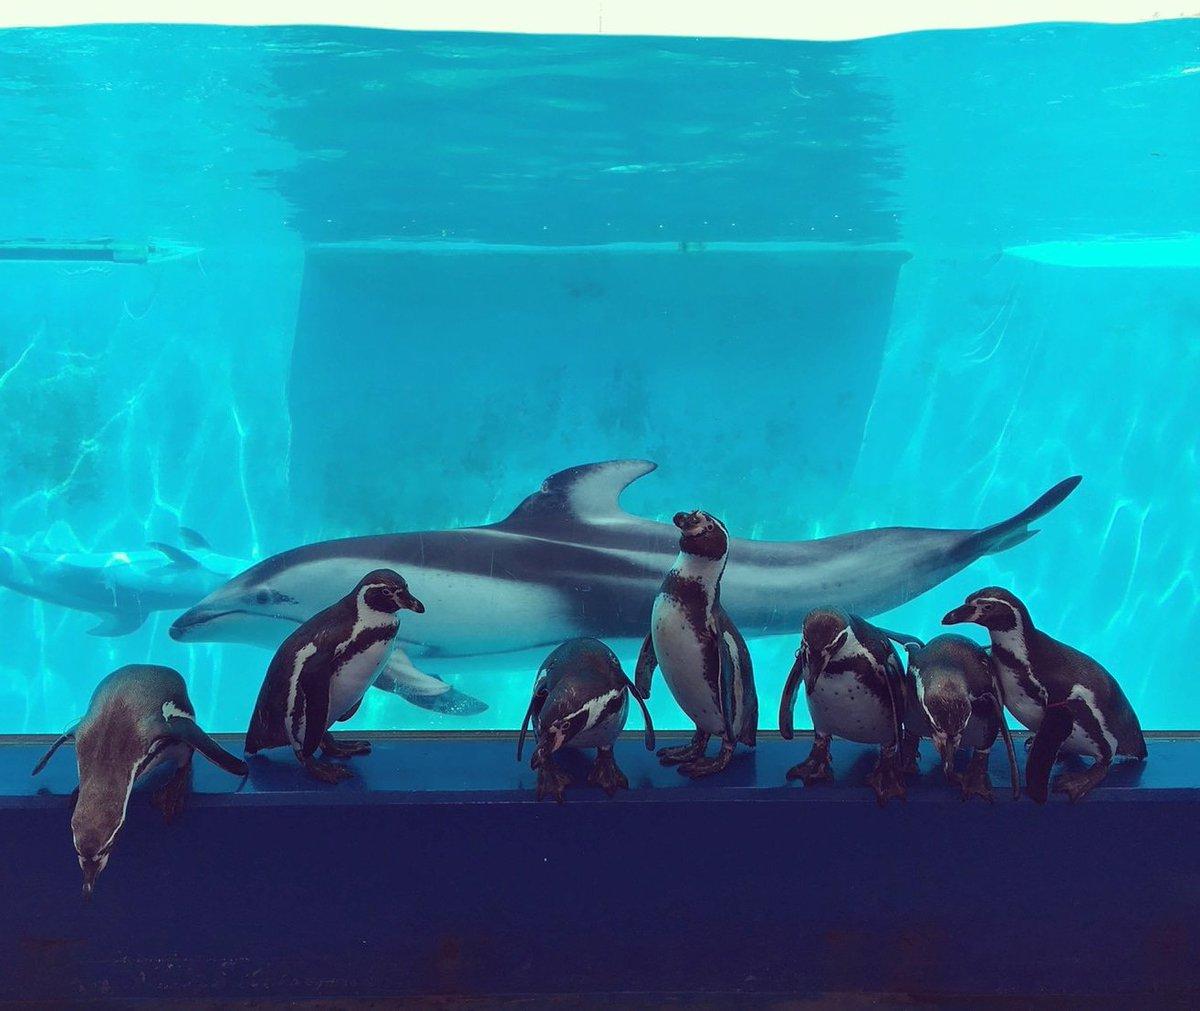 aquariumshimoda photo